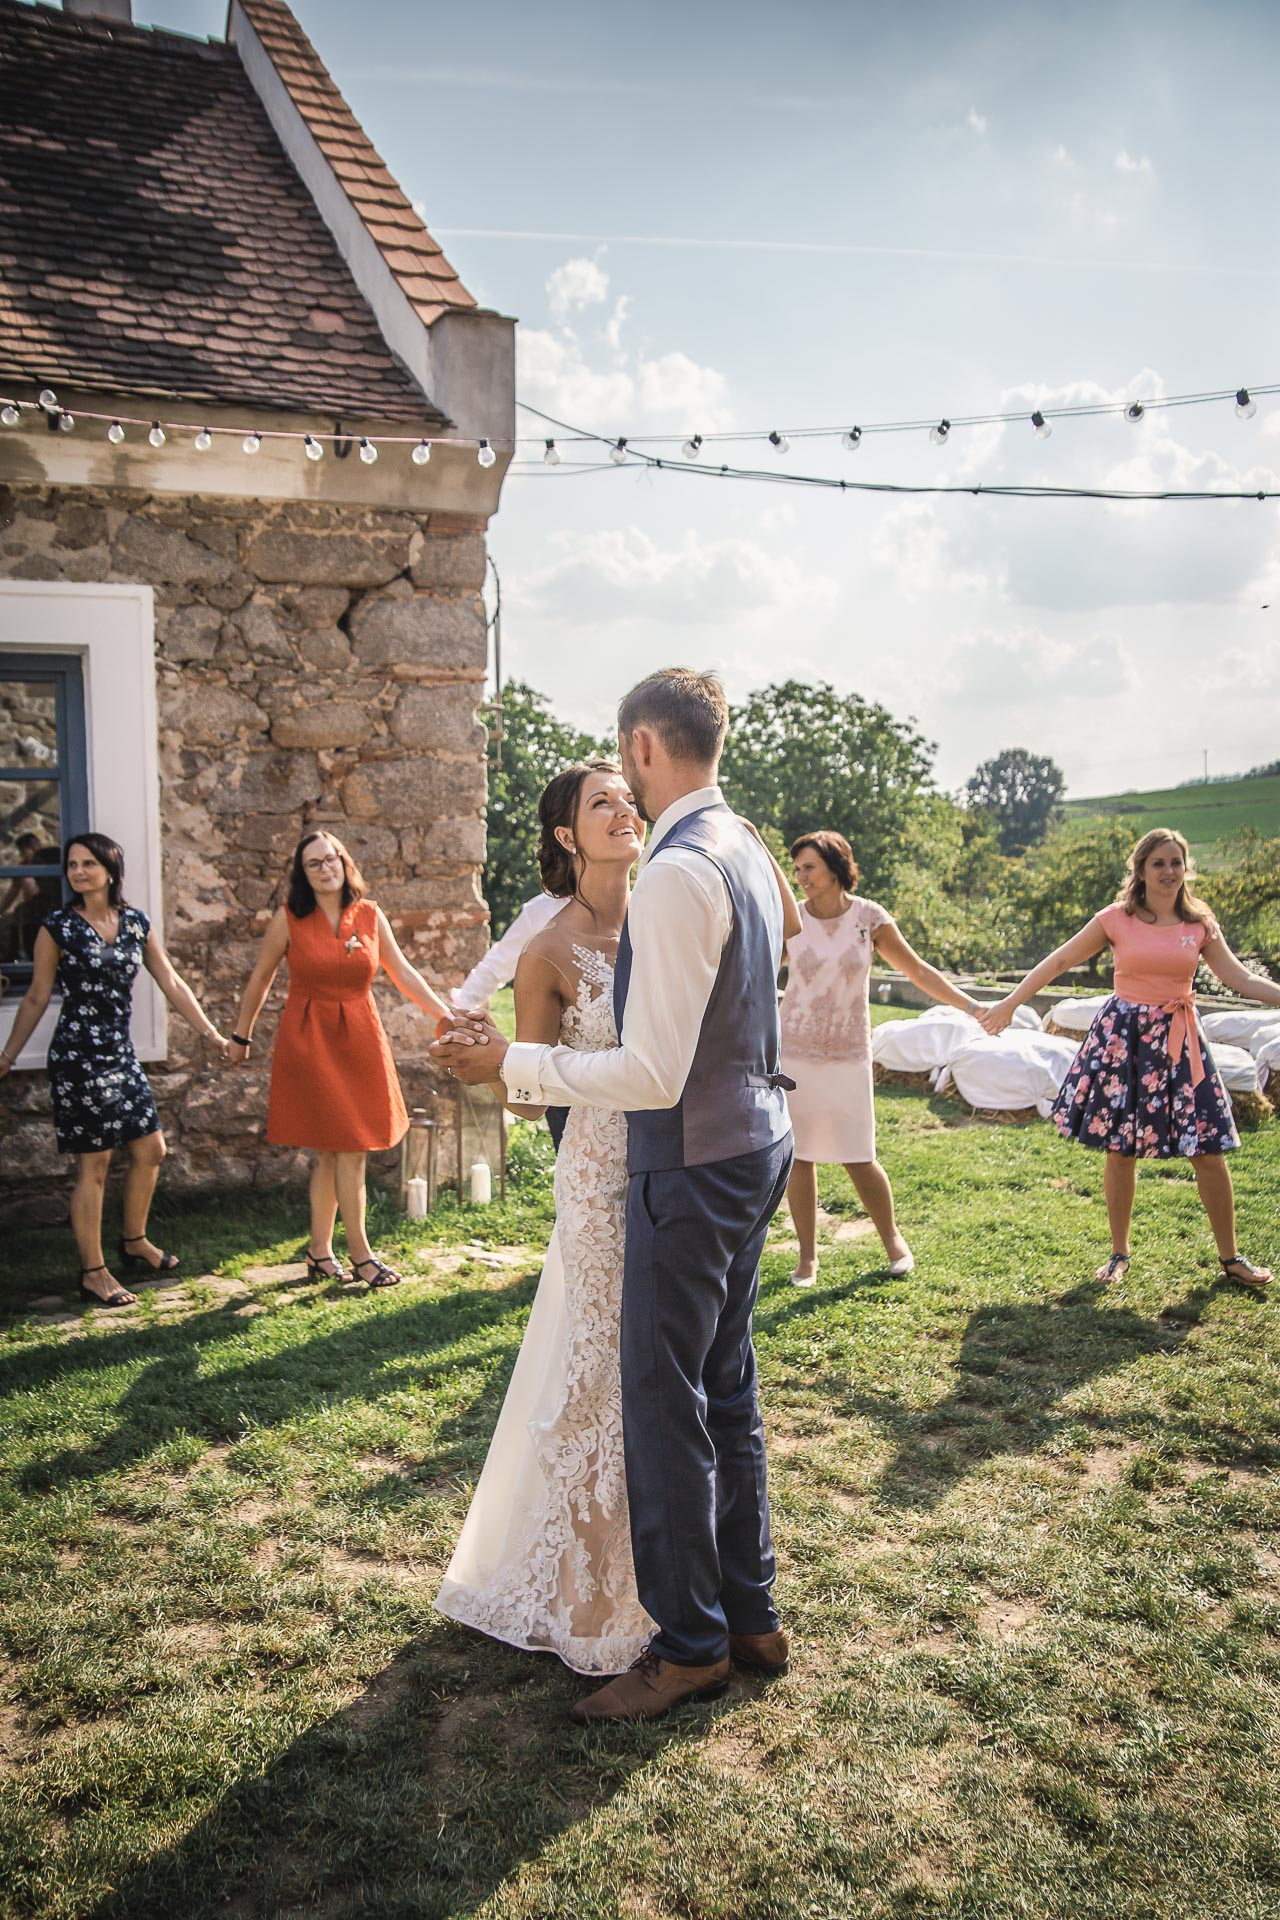 svatební-fotograf-wedding-svatebni-video-orlík-vltava-kostel-statek-stodola-boho-svatba-Beautyfoto-437